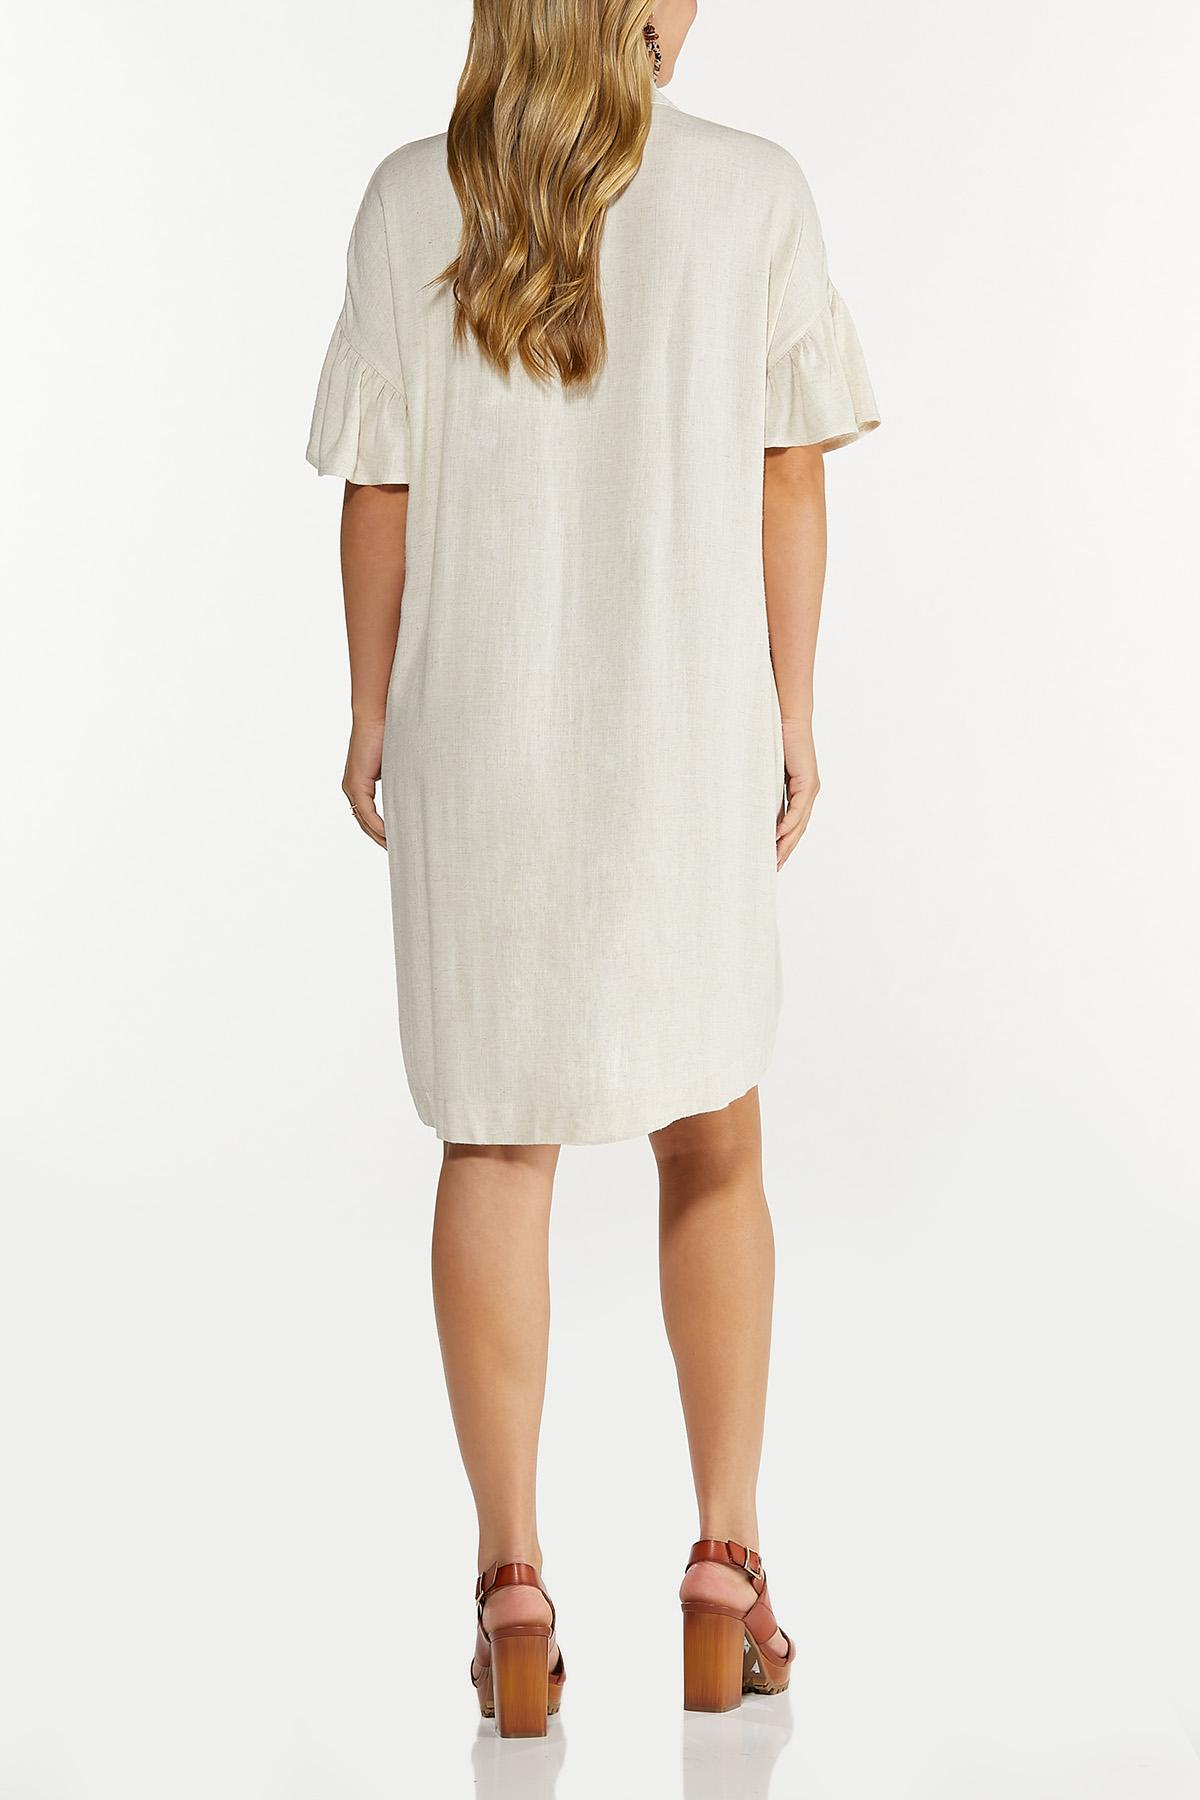 Plus Size Ruffled Sleeve Linen Dress (Item #44619593)